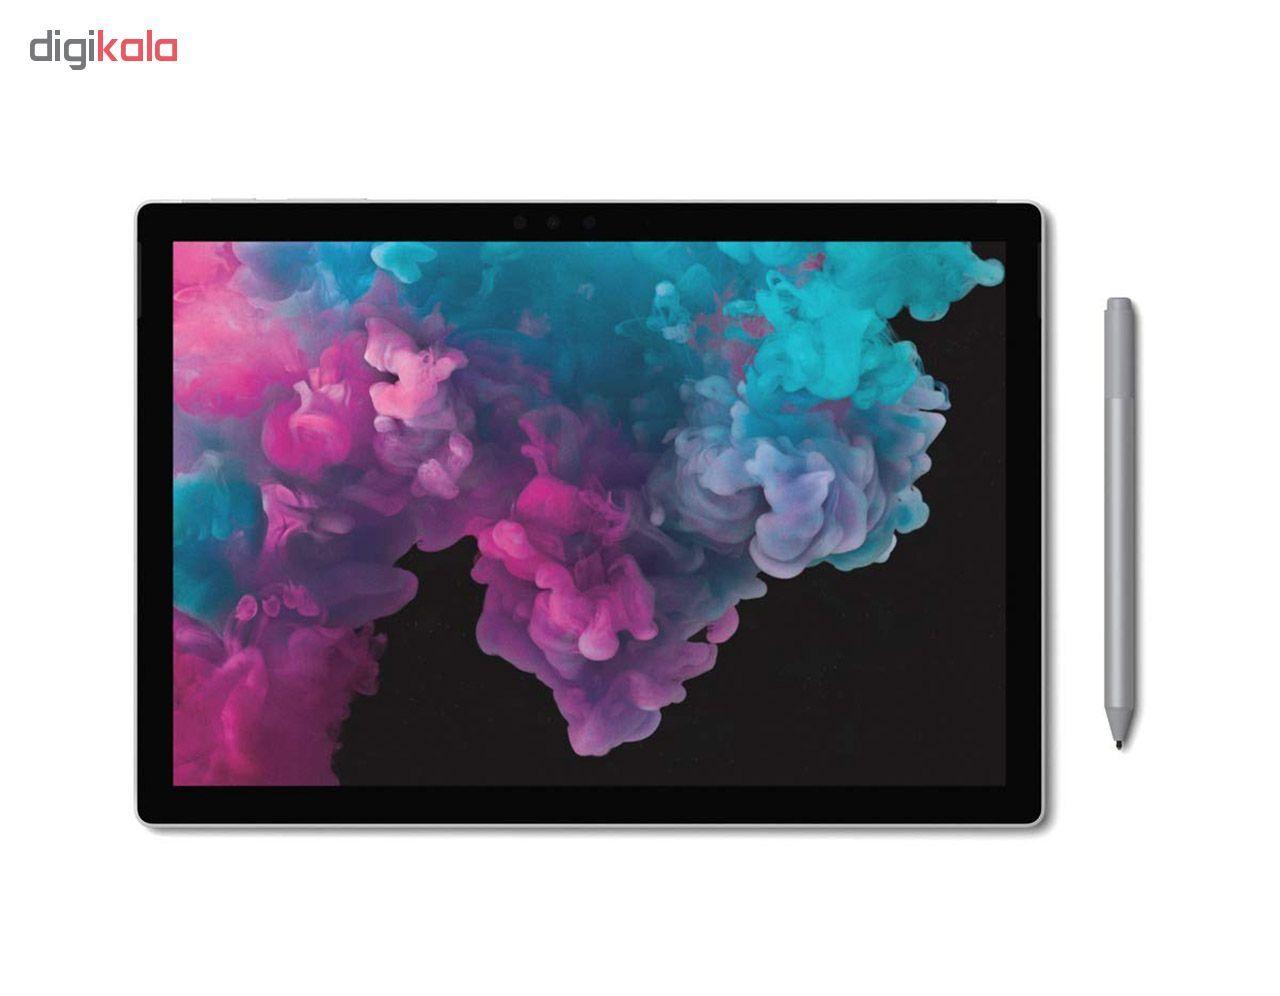 تبلت مایکروسافت مدل Surface Pro 6 - LQ6 به همراه کیبورد TYPE COVER و قلم main 1 15